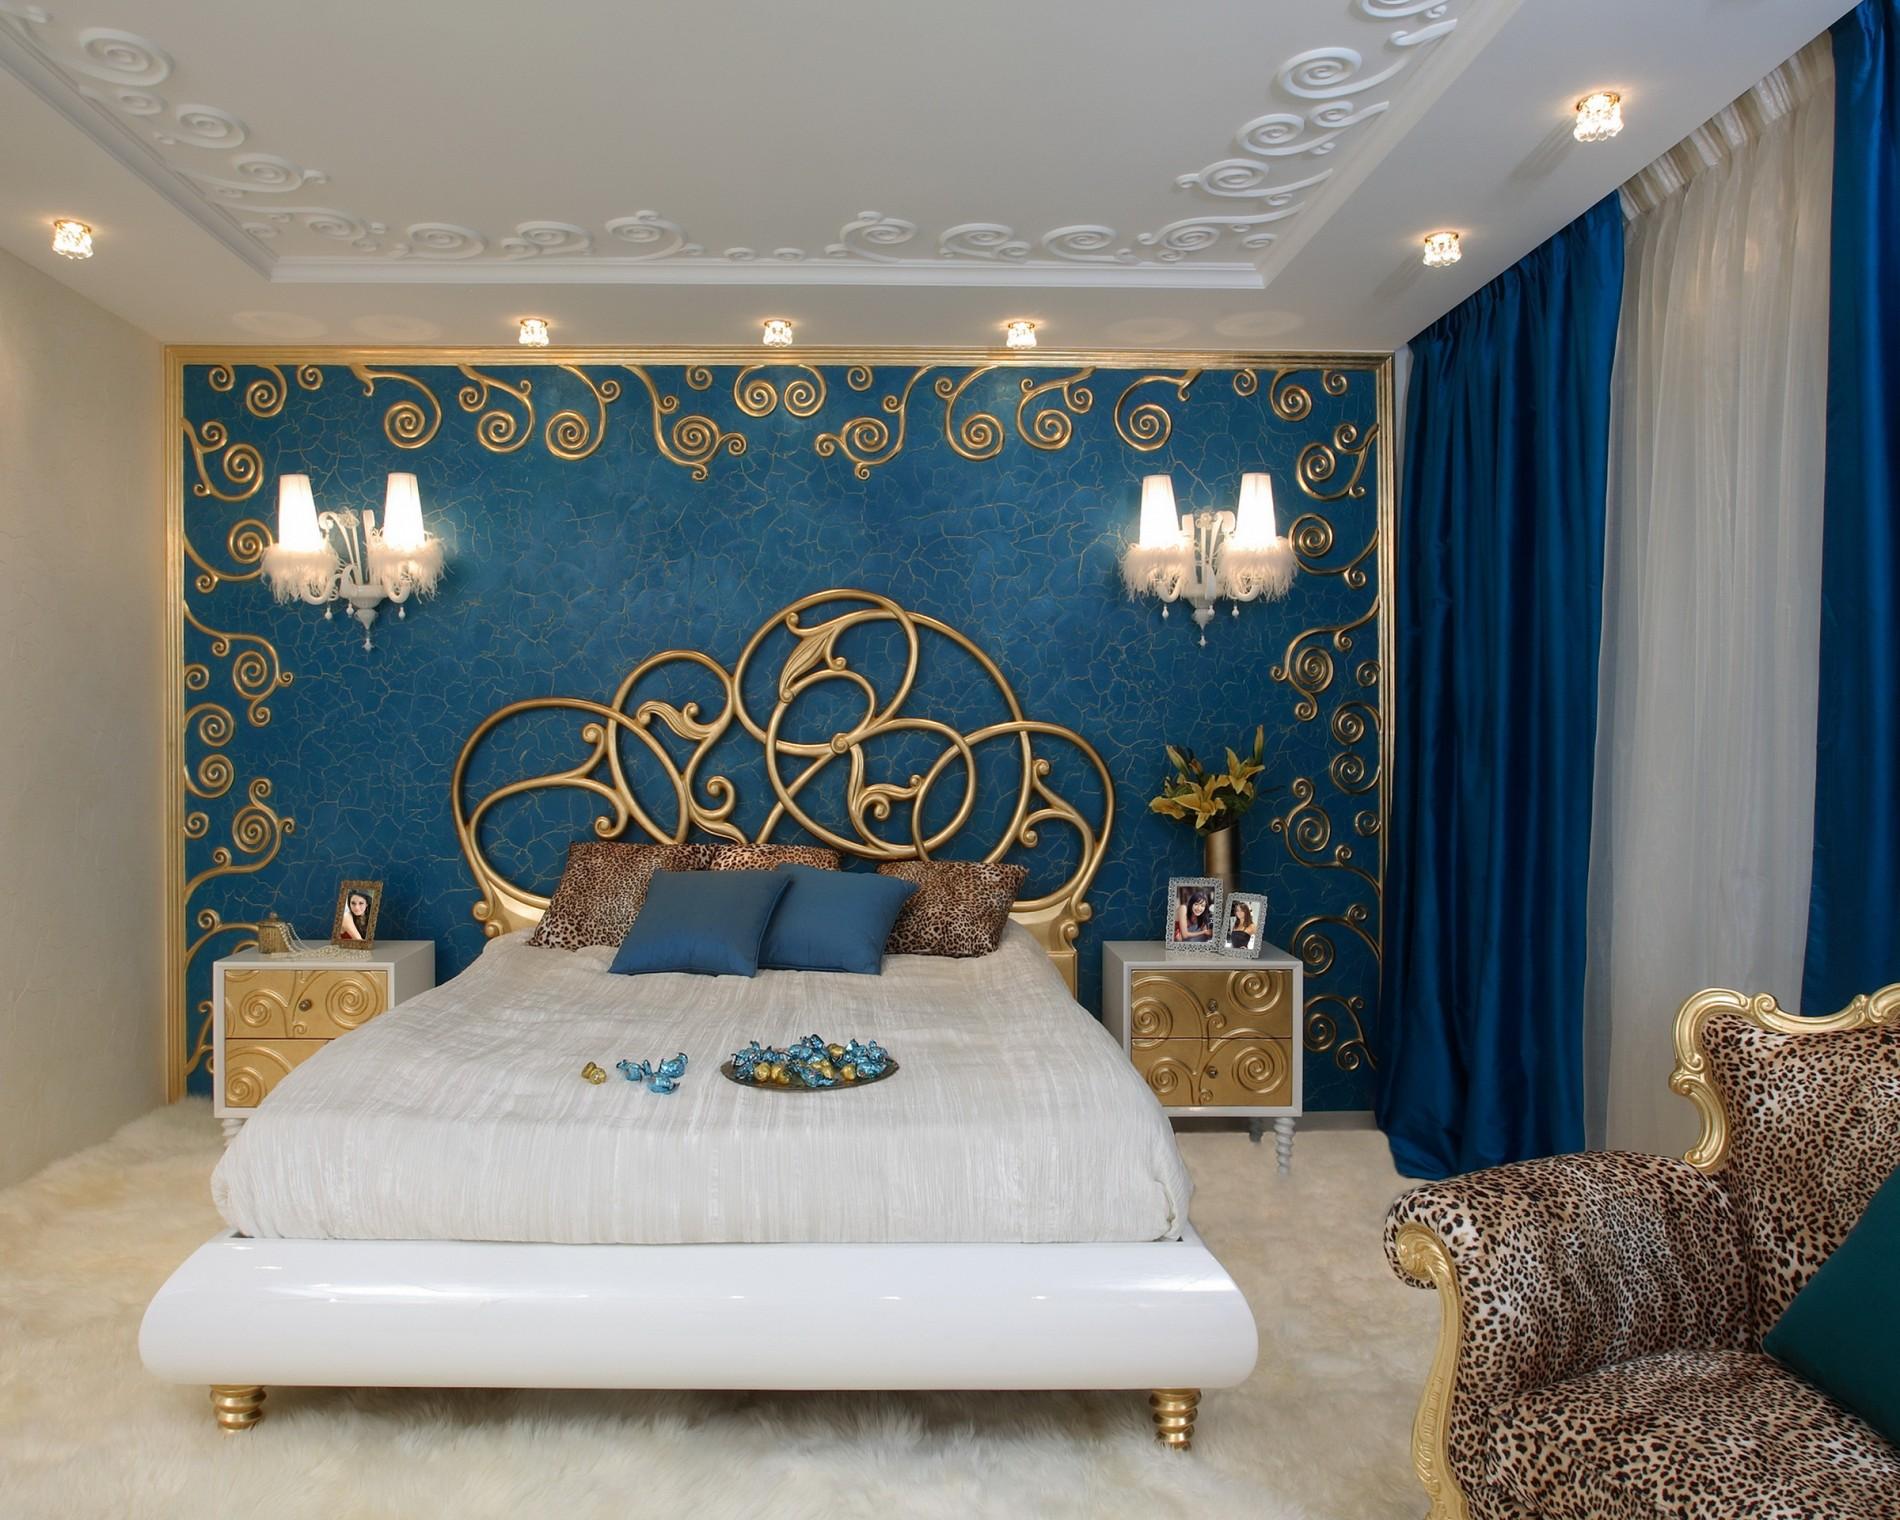 Стильный интерьер спальни Ар Деко